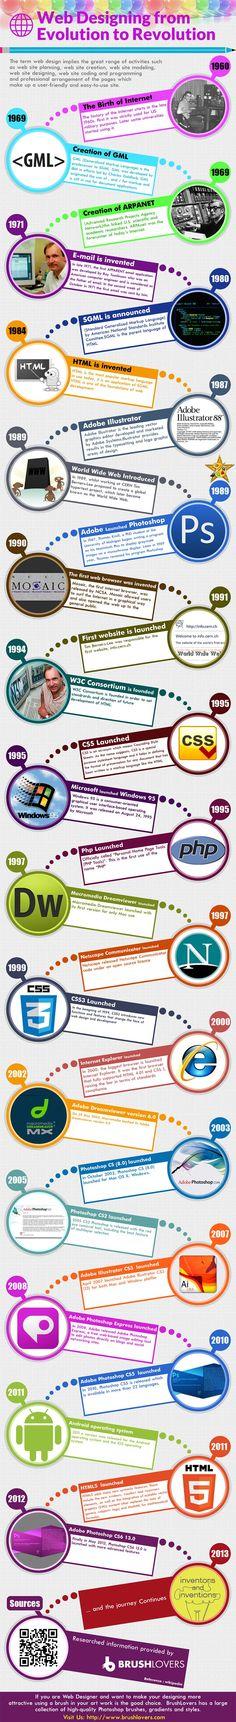 #WebDesign from Evolution to Revolution